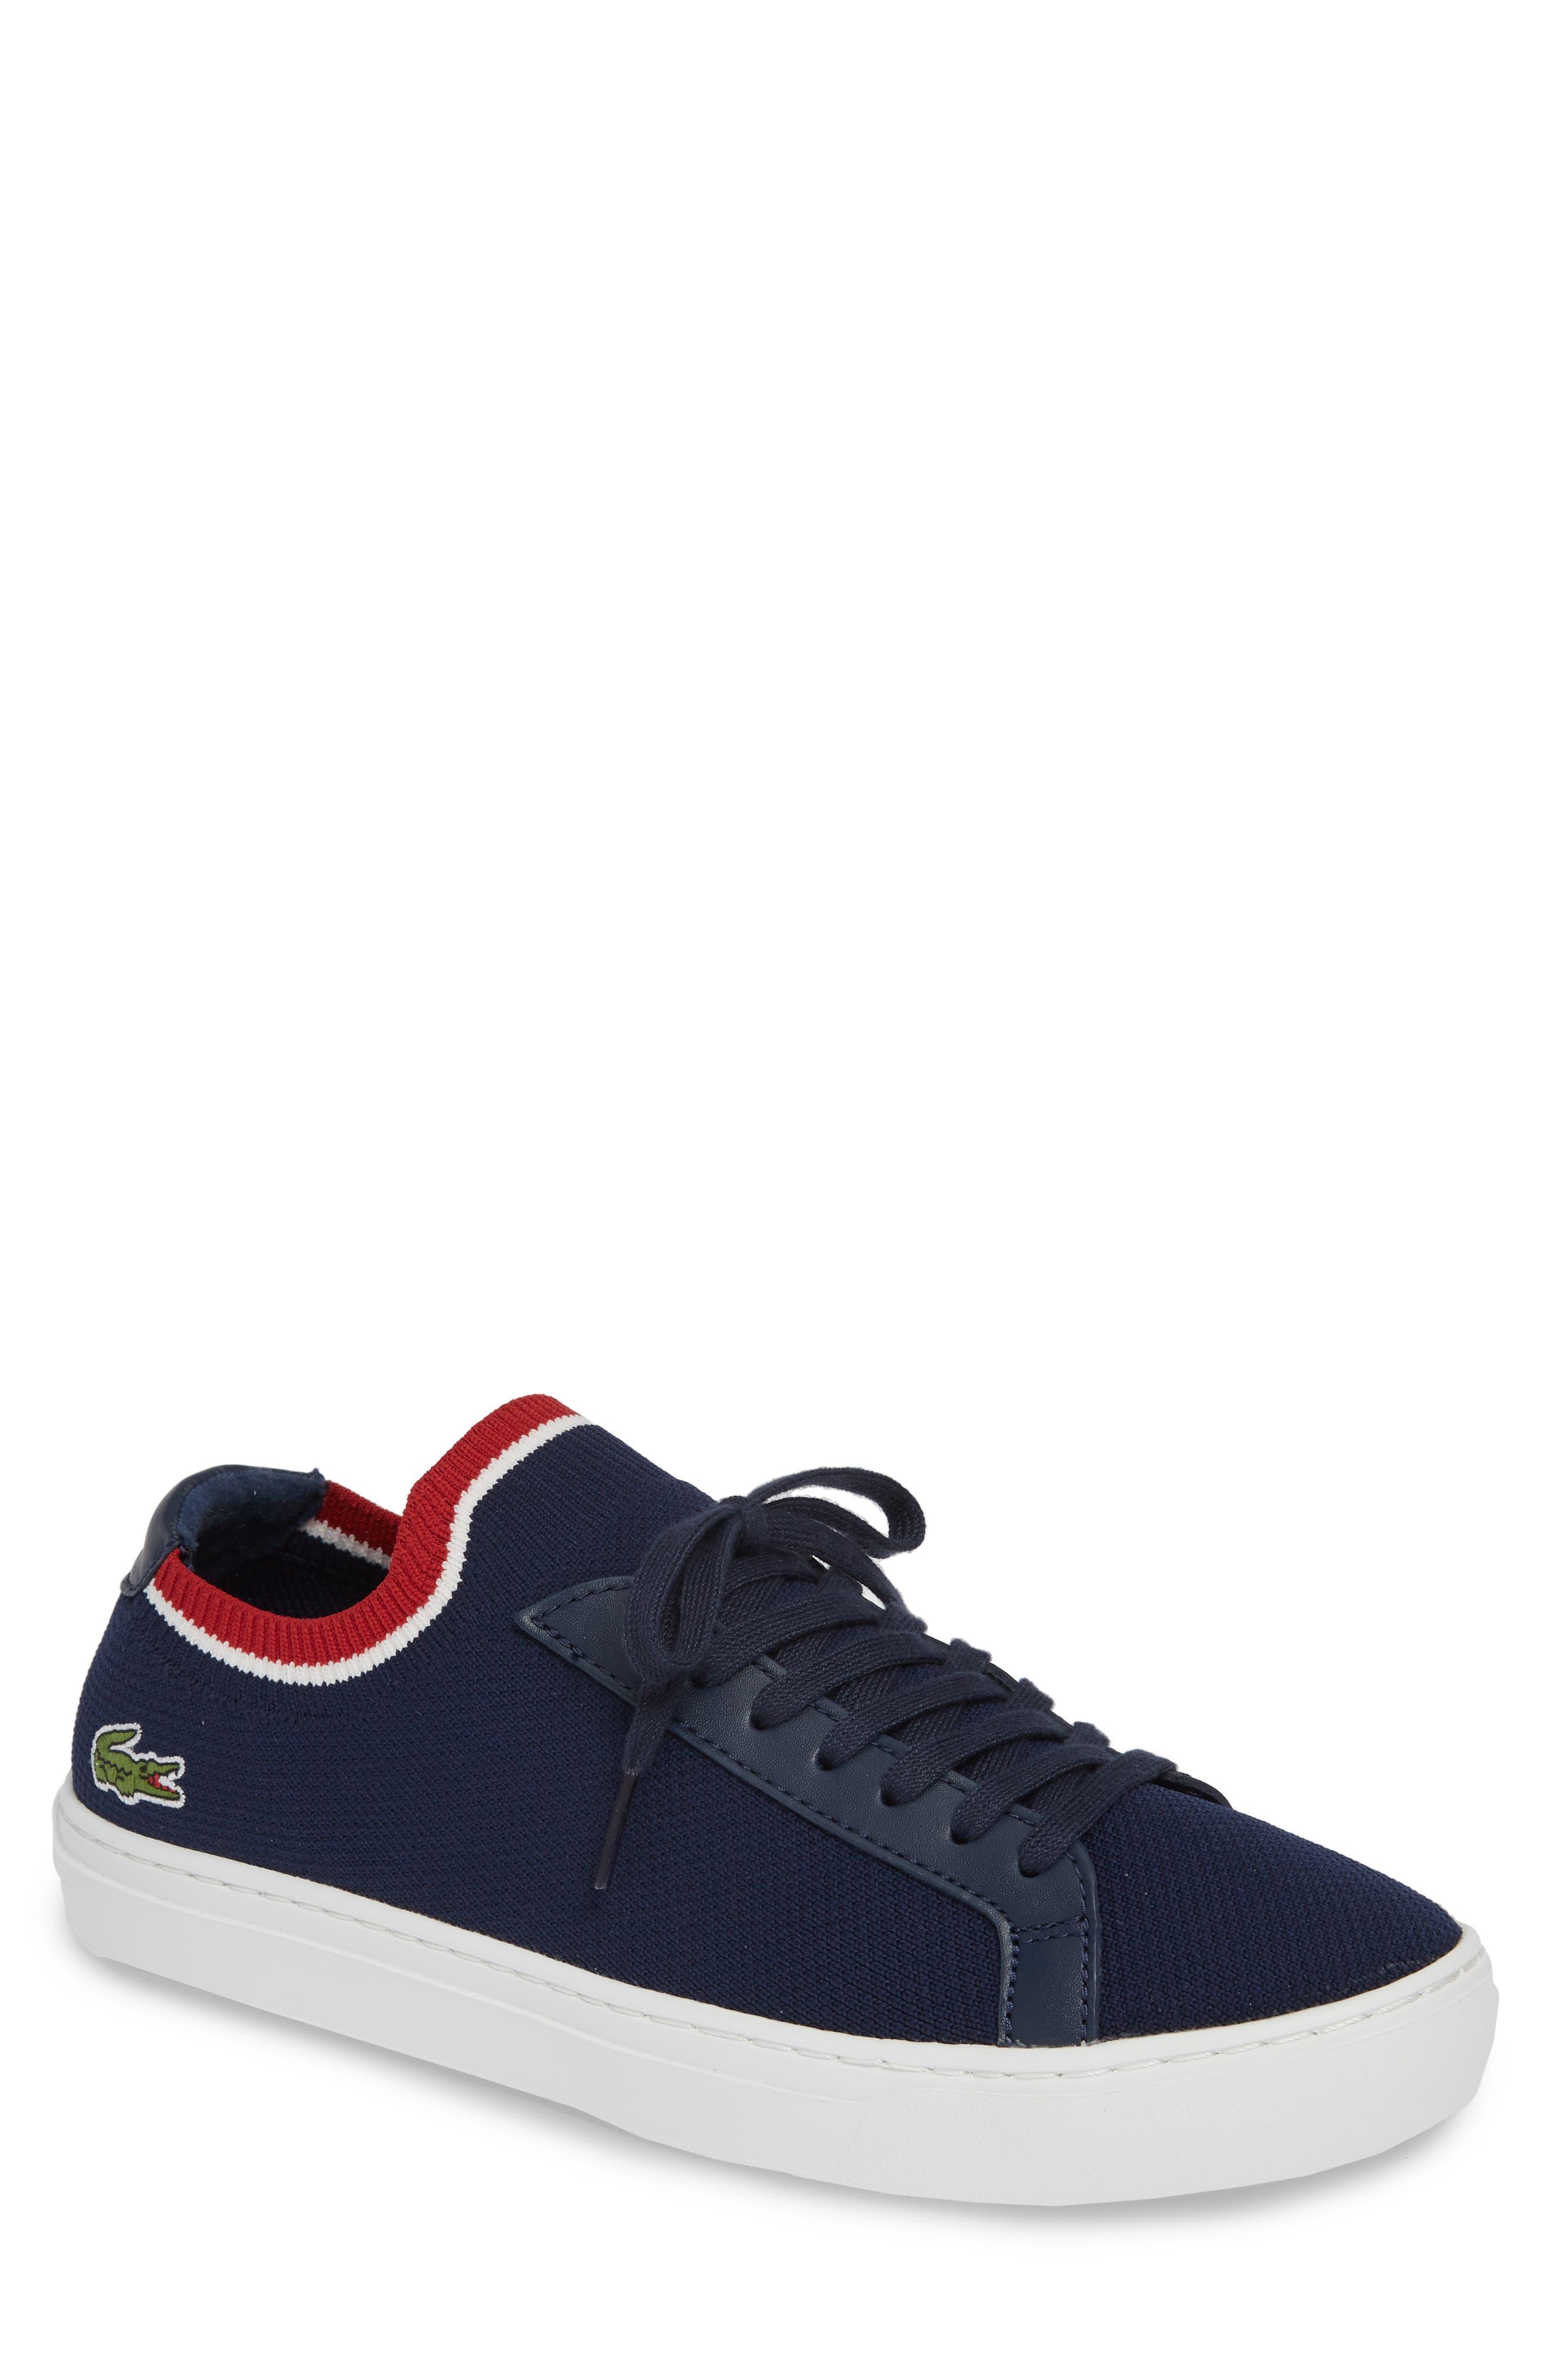 Lacoste Pique Knit Sneaker, Blue